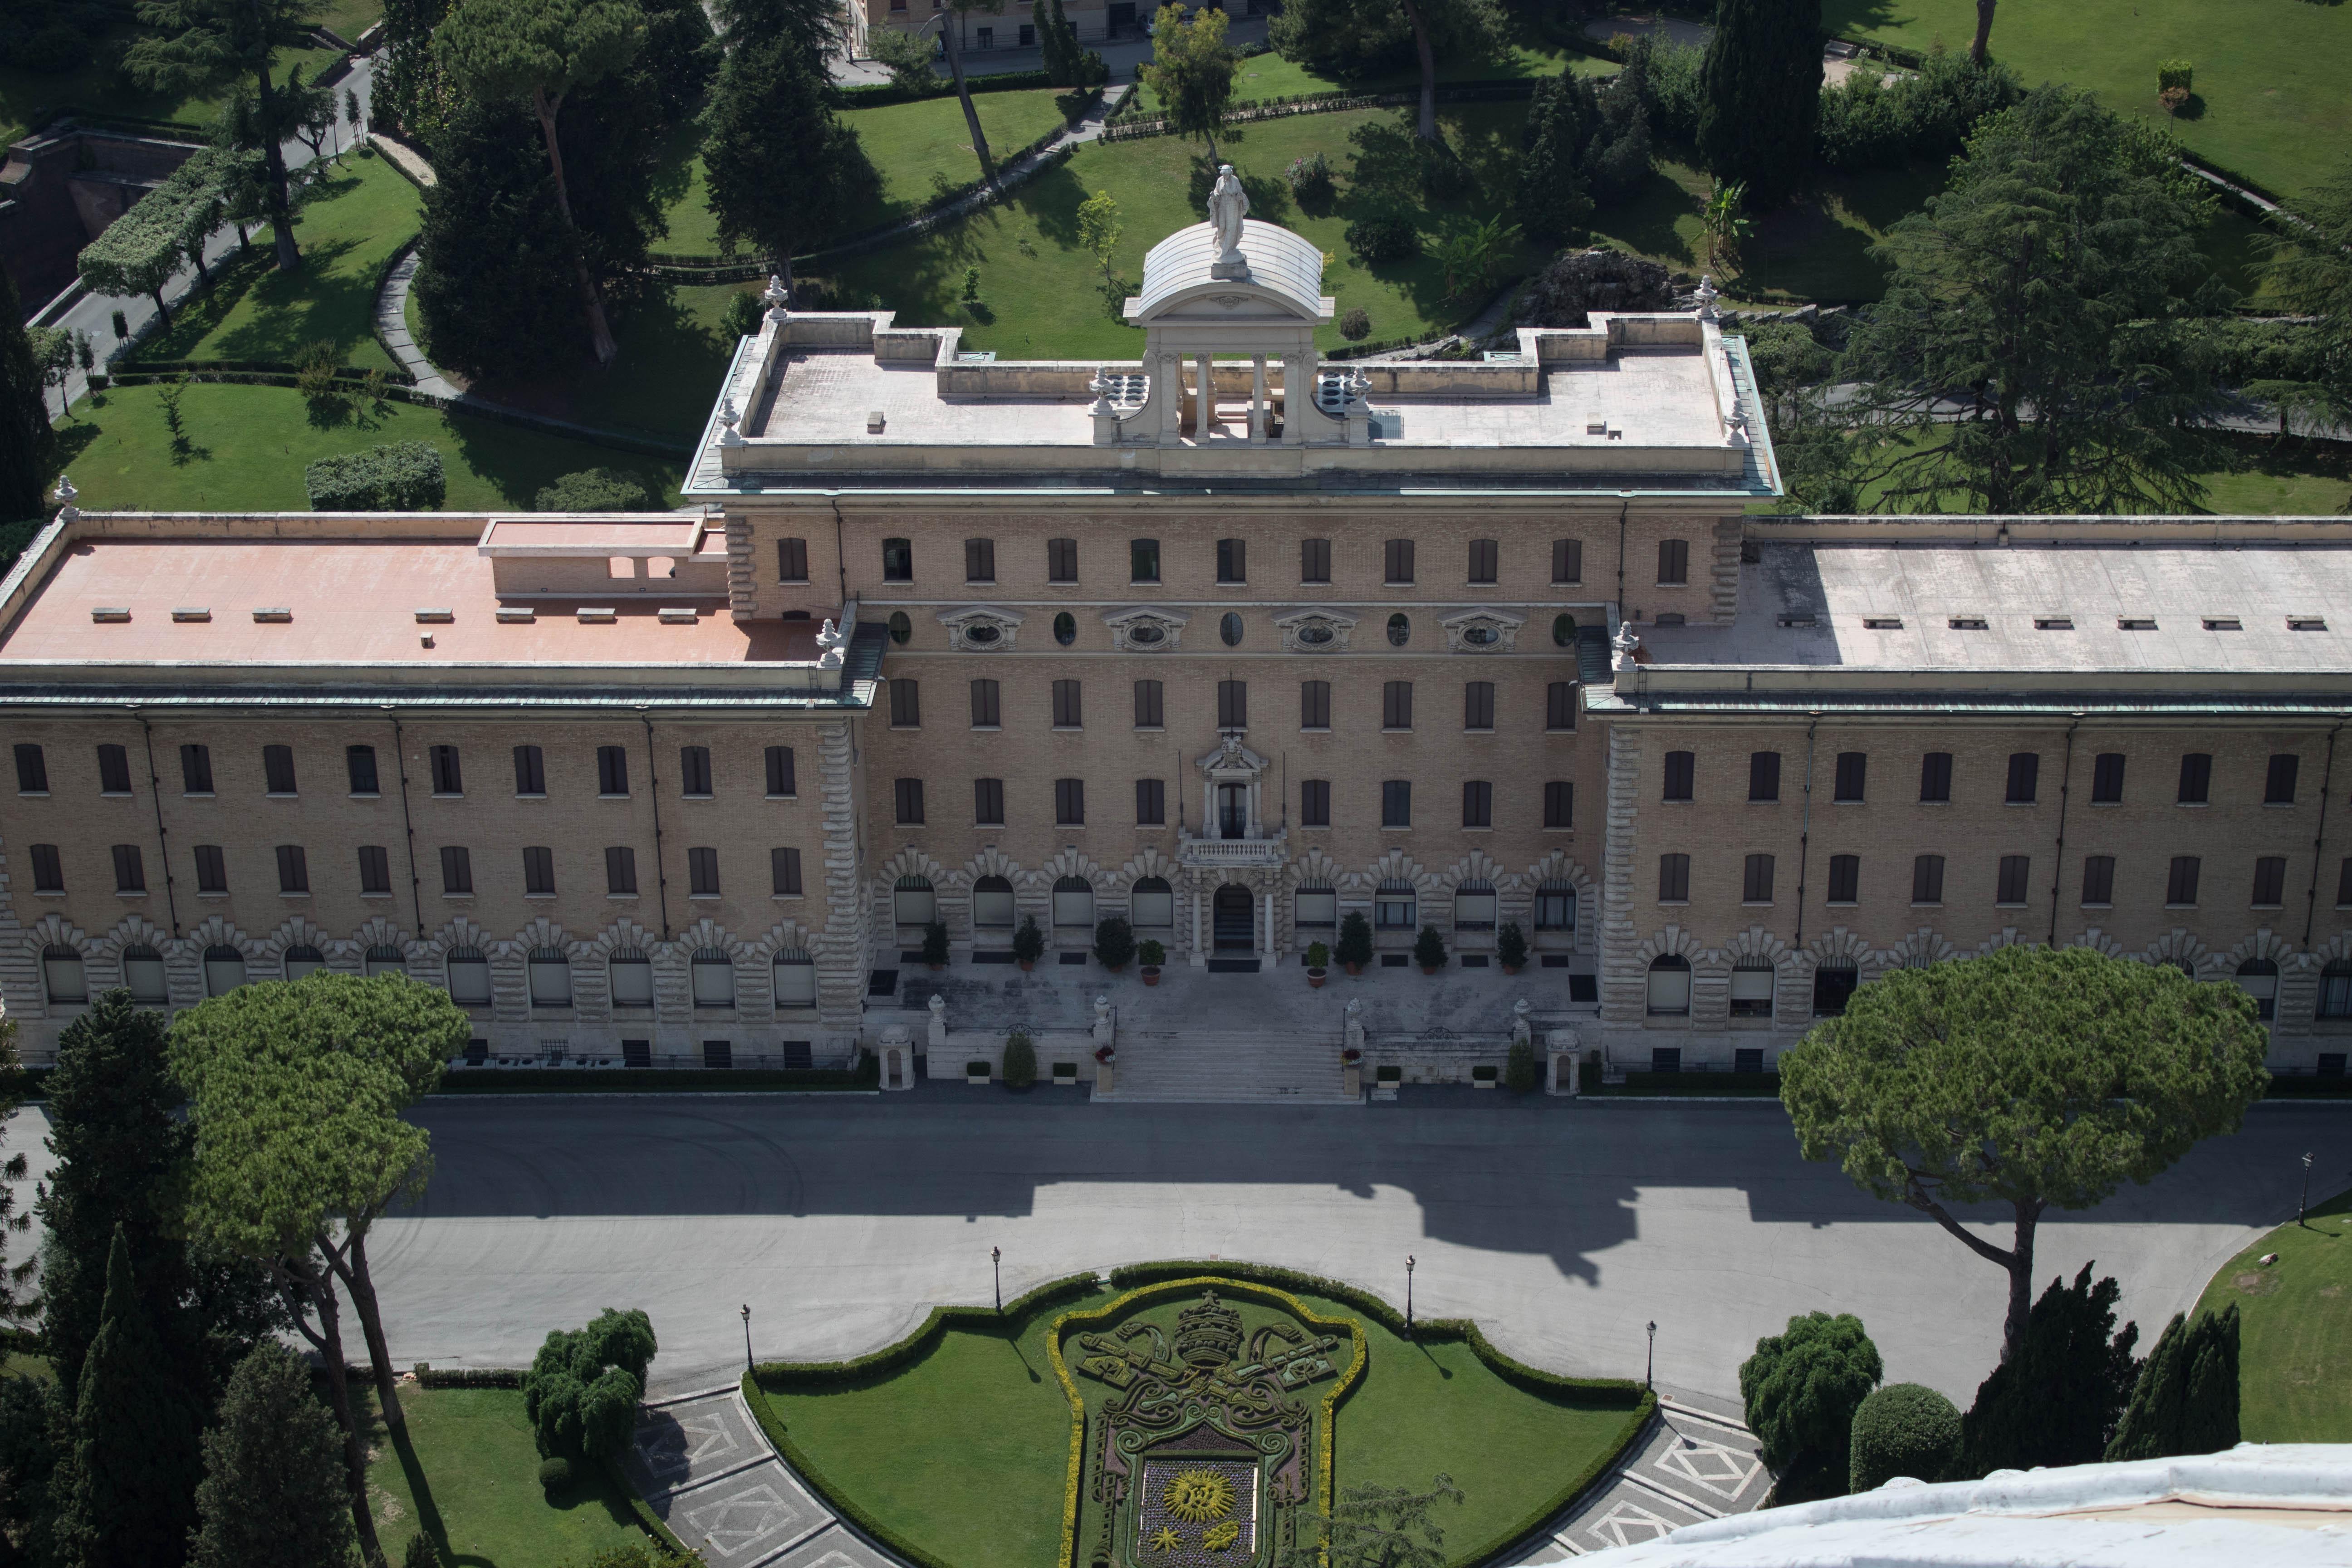 Vaticano. Cúpula da Basílica. Vista